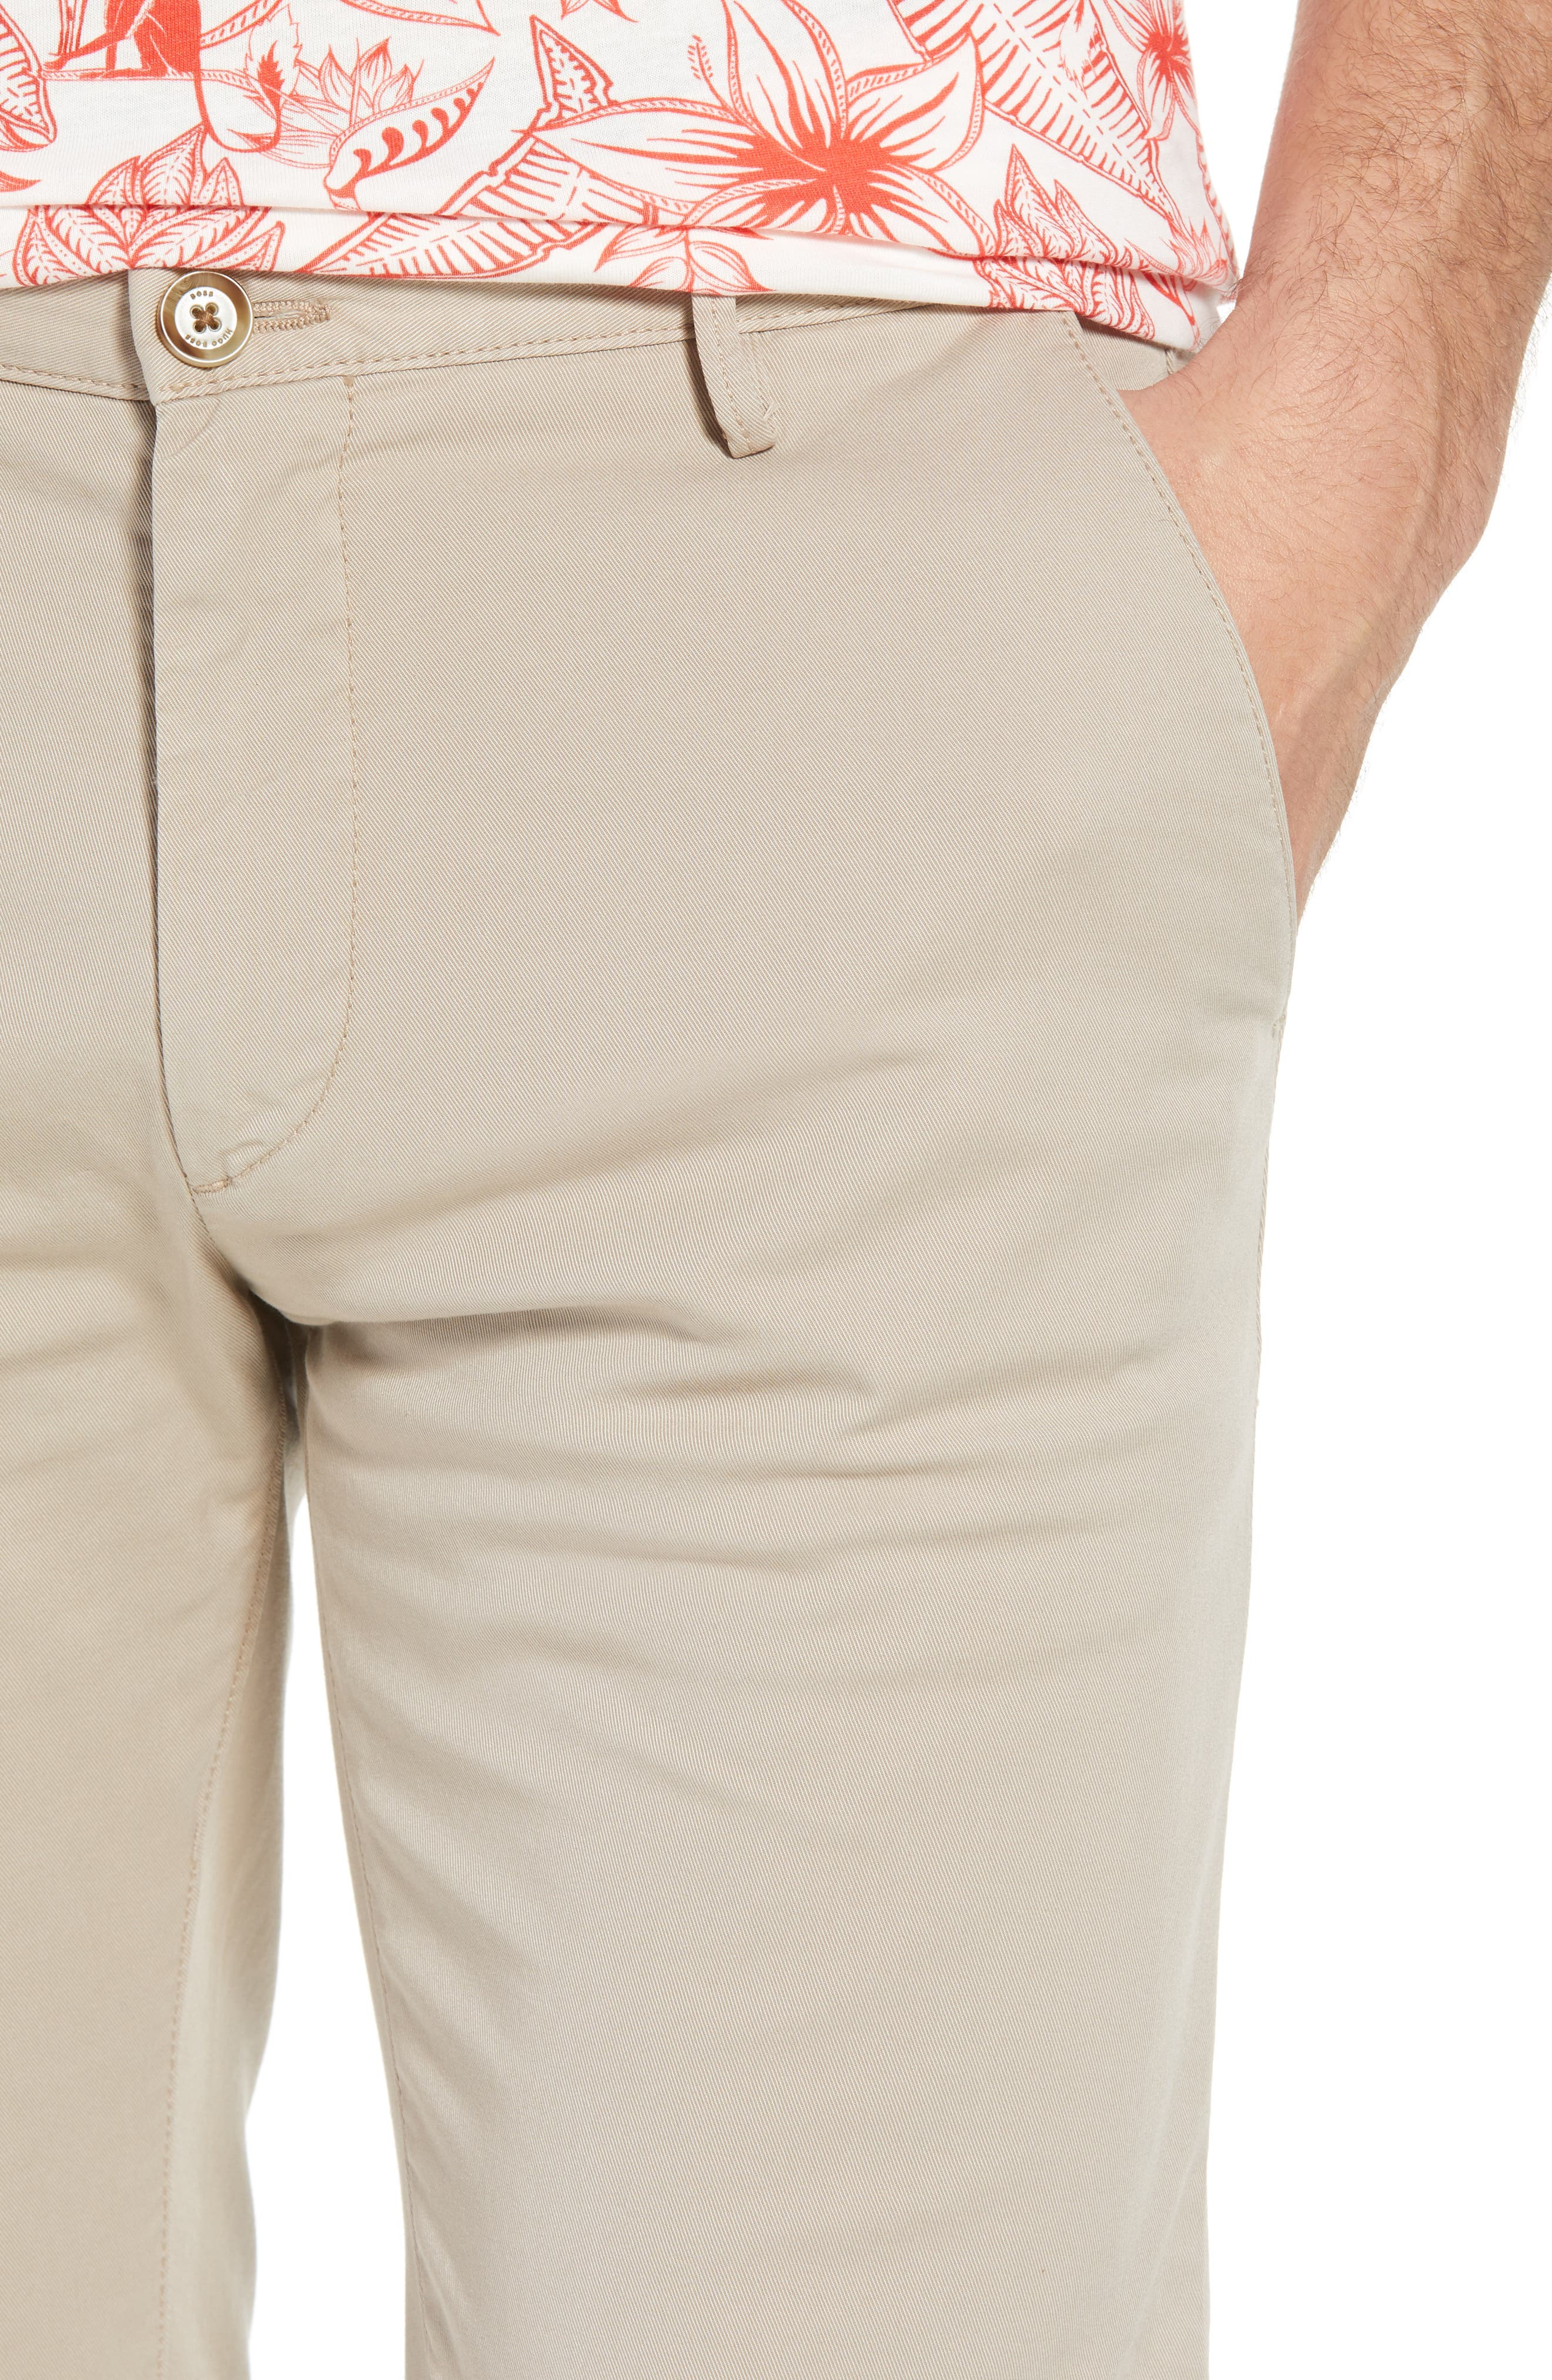 Rice Slim Fit Chino Pants,                             Alternate thumbnail 4, color,                             Brown